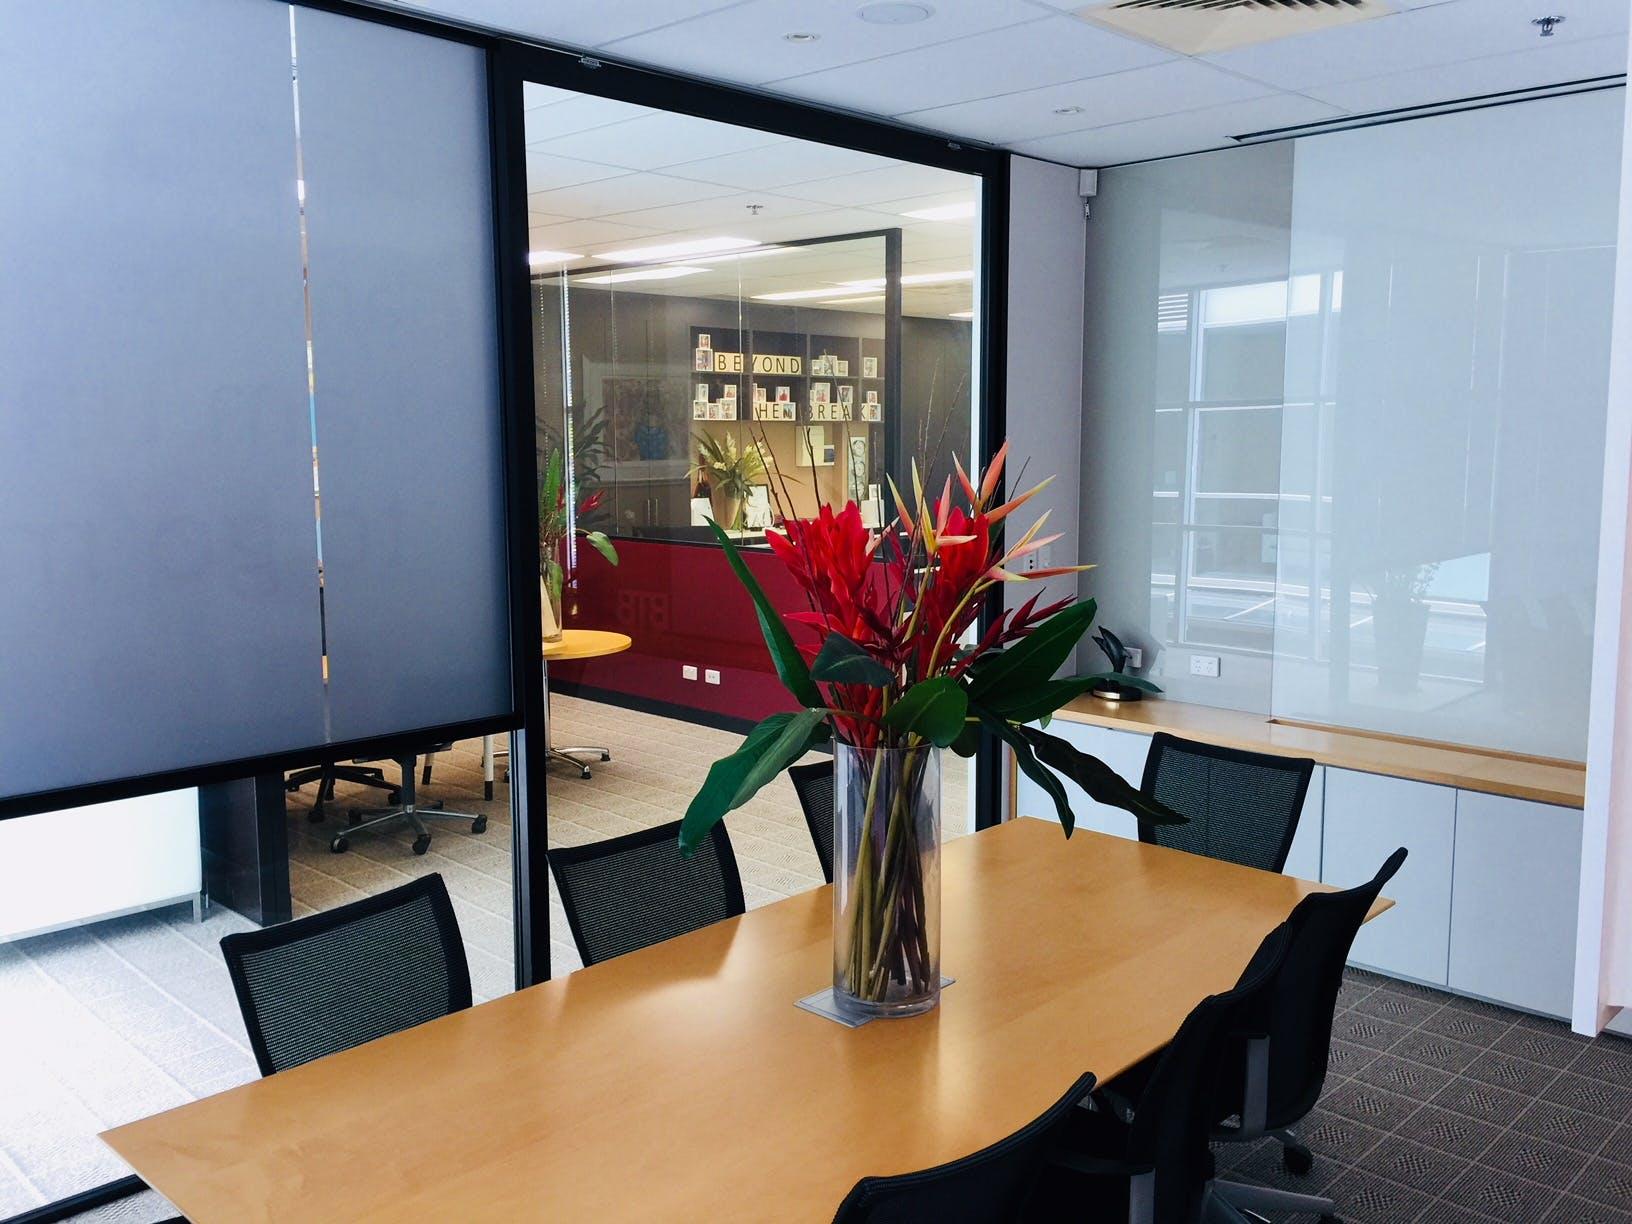 Board Room, meeting room at Brookvale Business, image 2